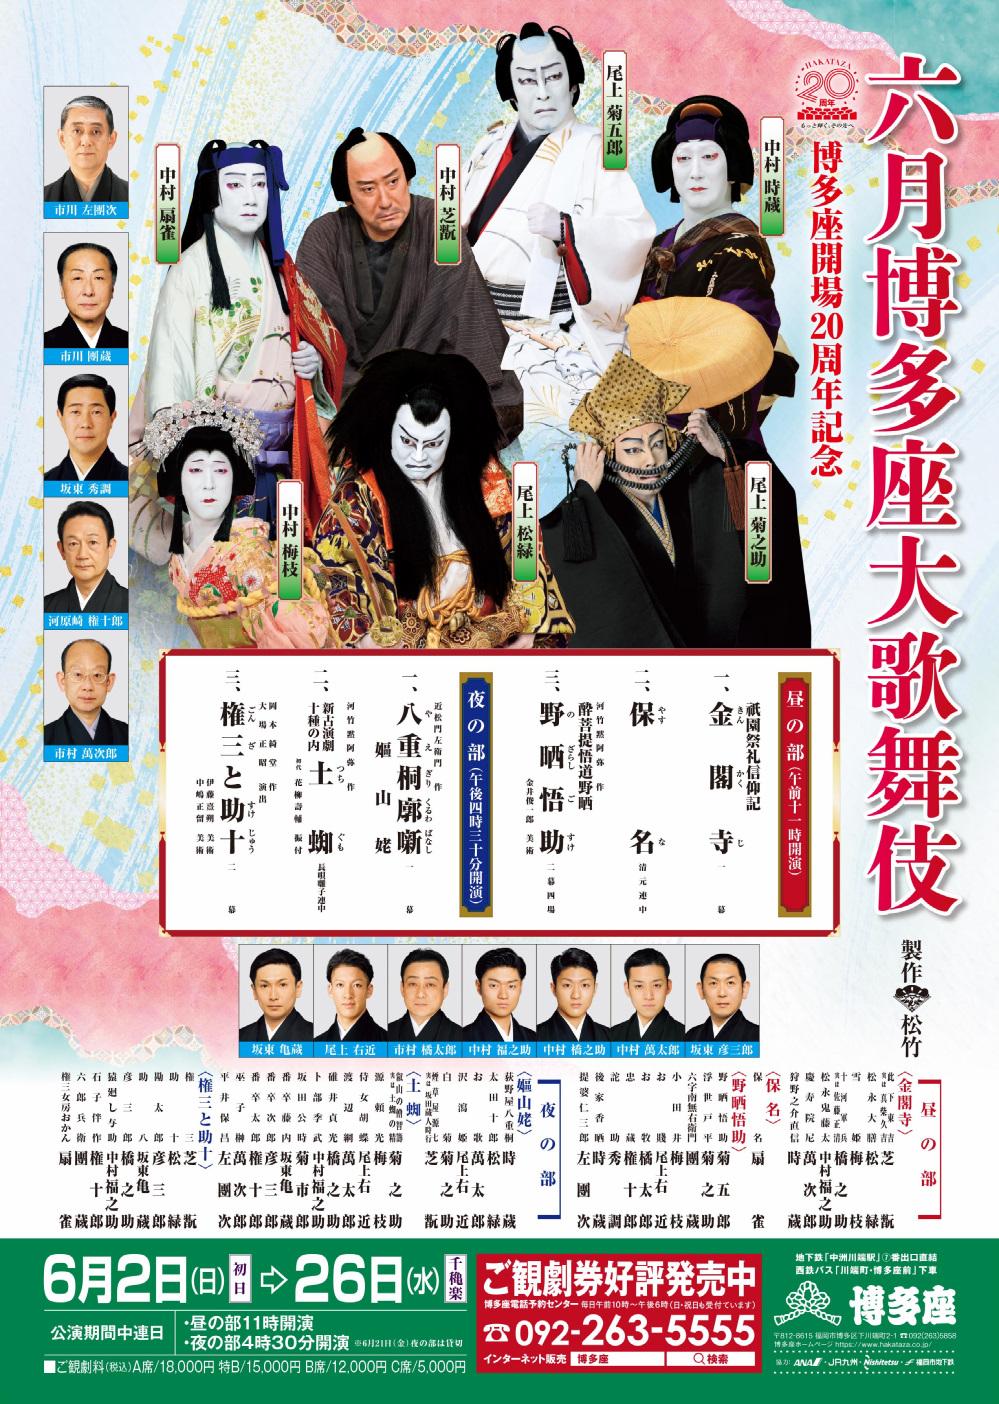 座 公演 博多 博多座が公演中止期間延長を告知(2020.3.8)